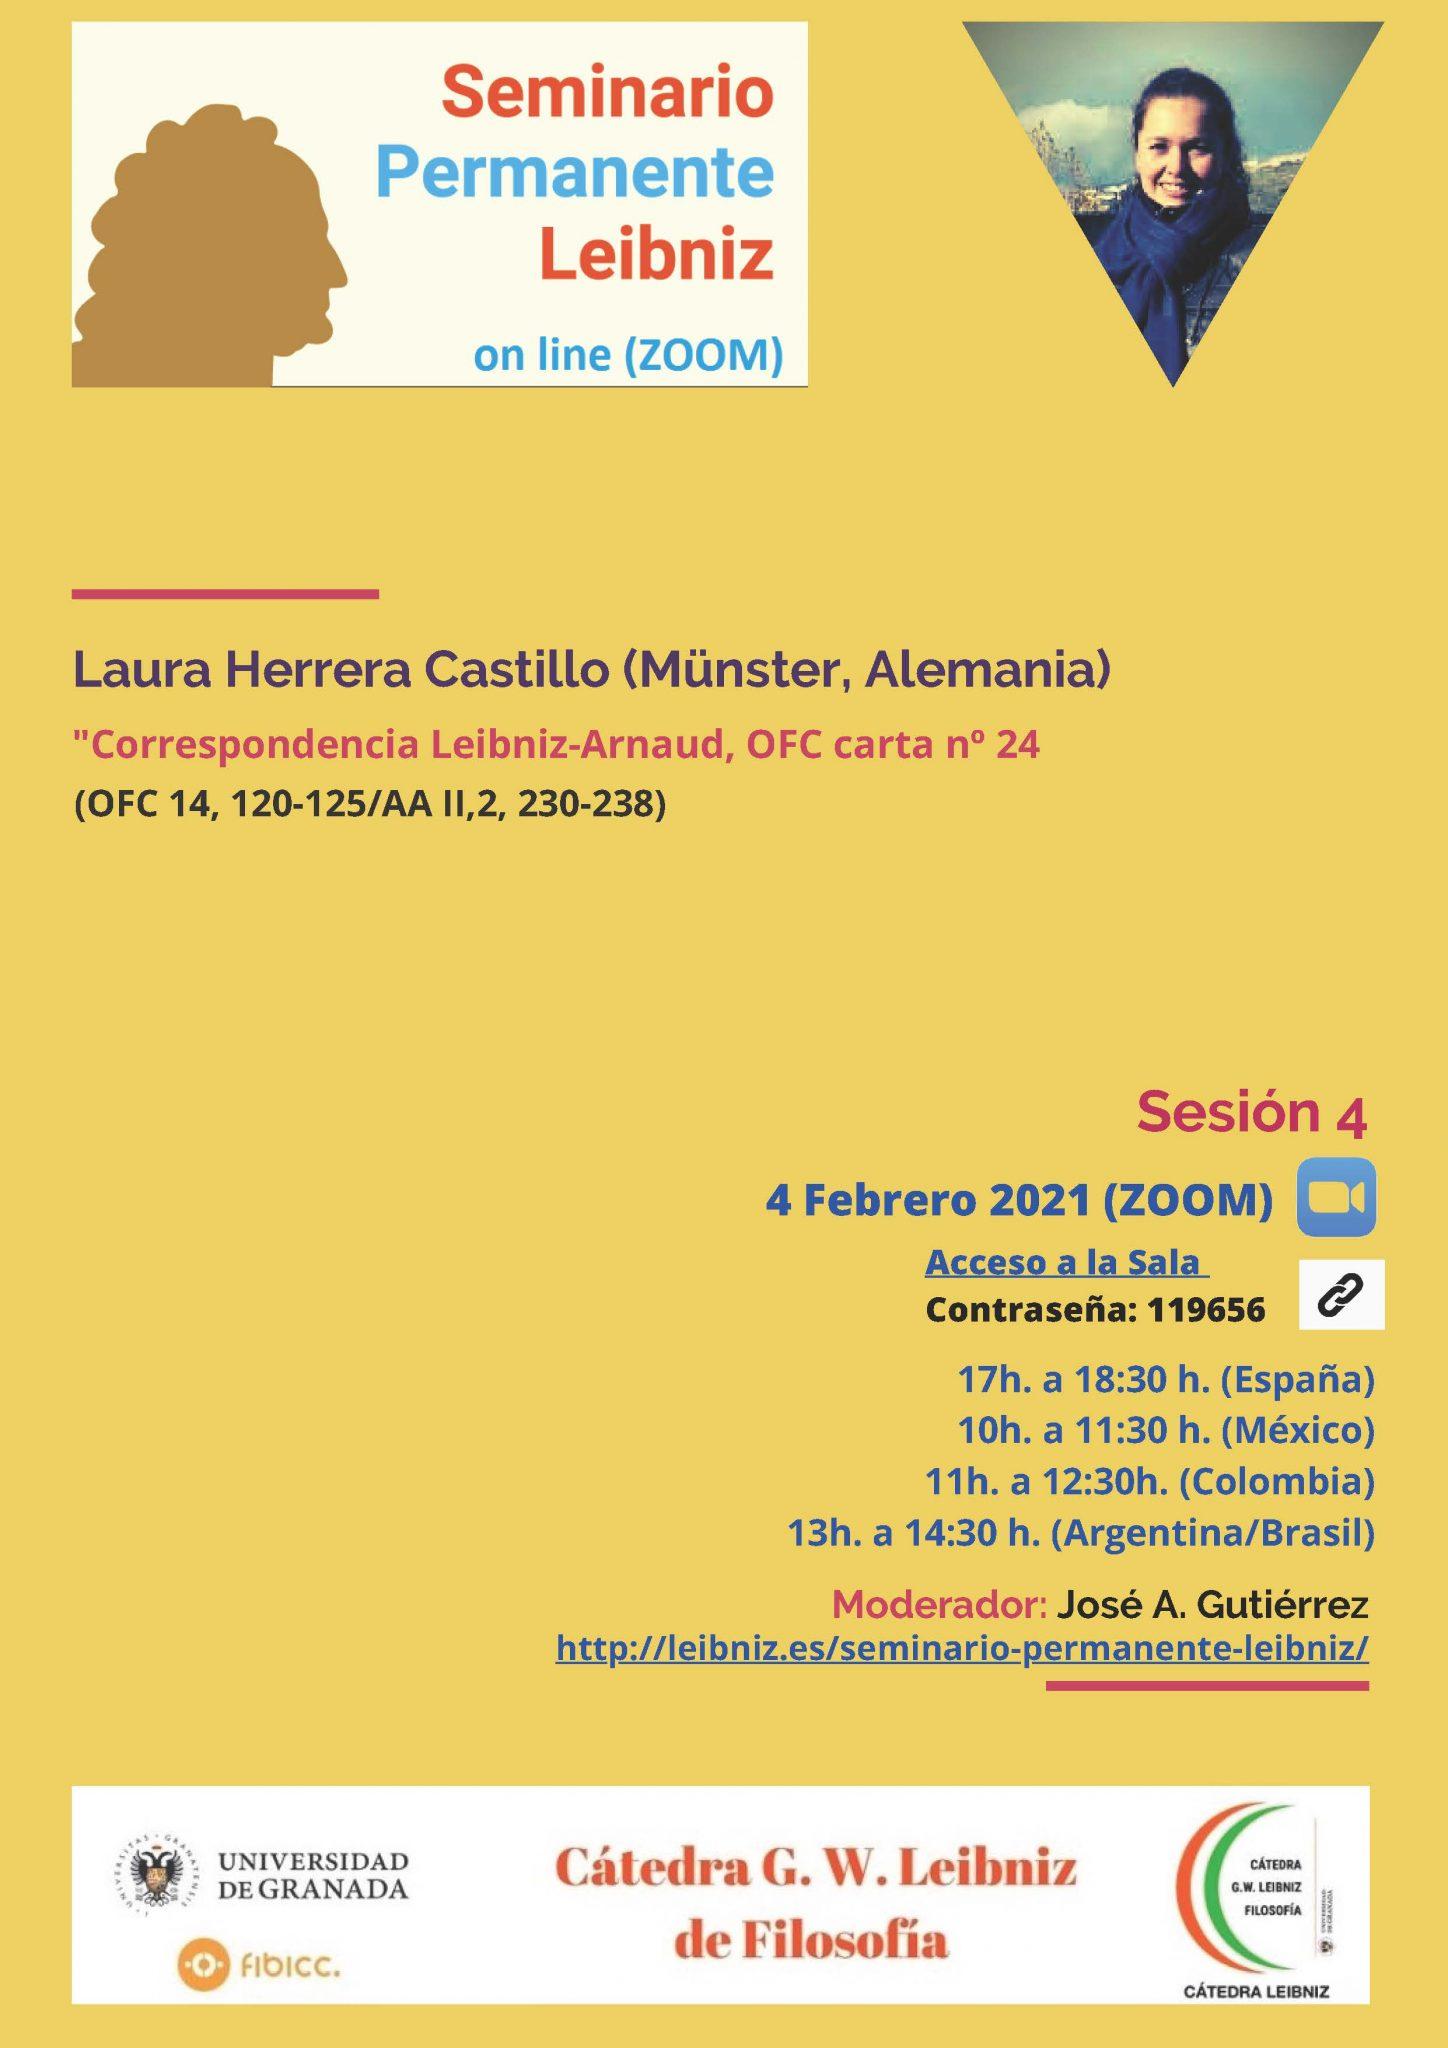 Sesión IV. Seminario Permanente Leibniz (on-line)